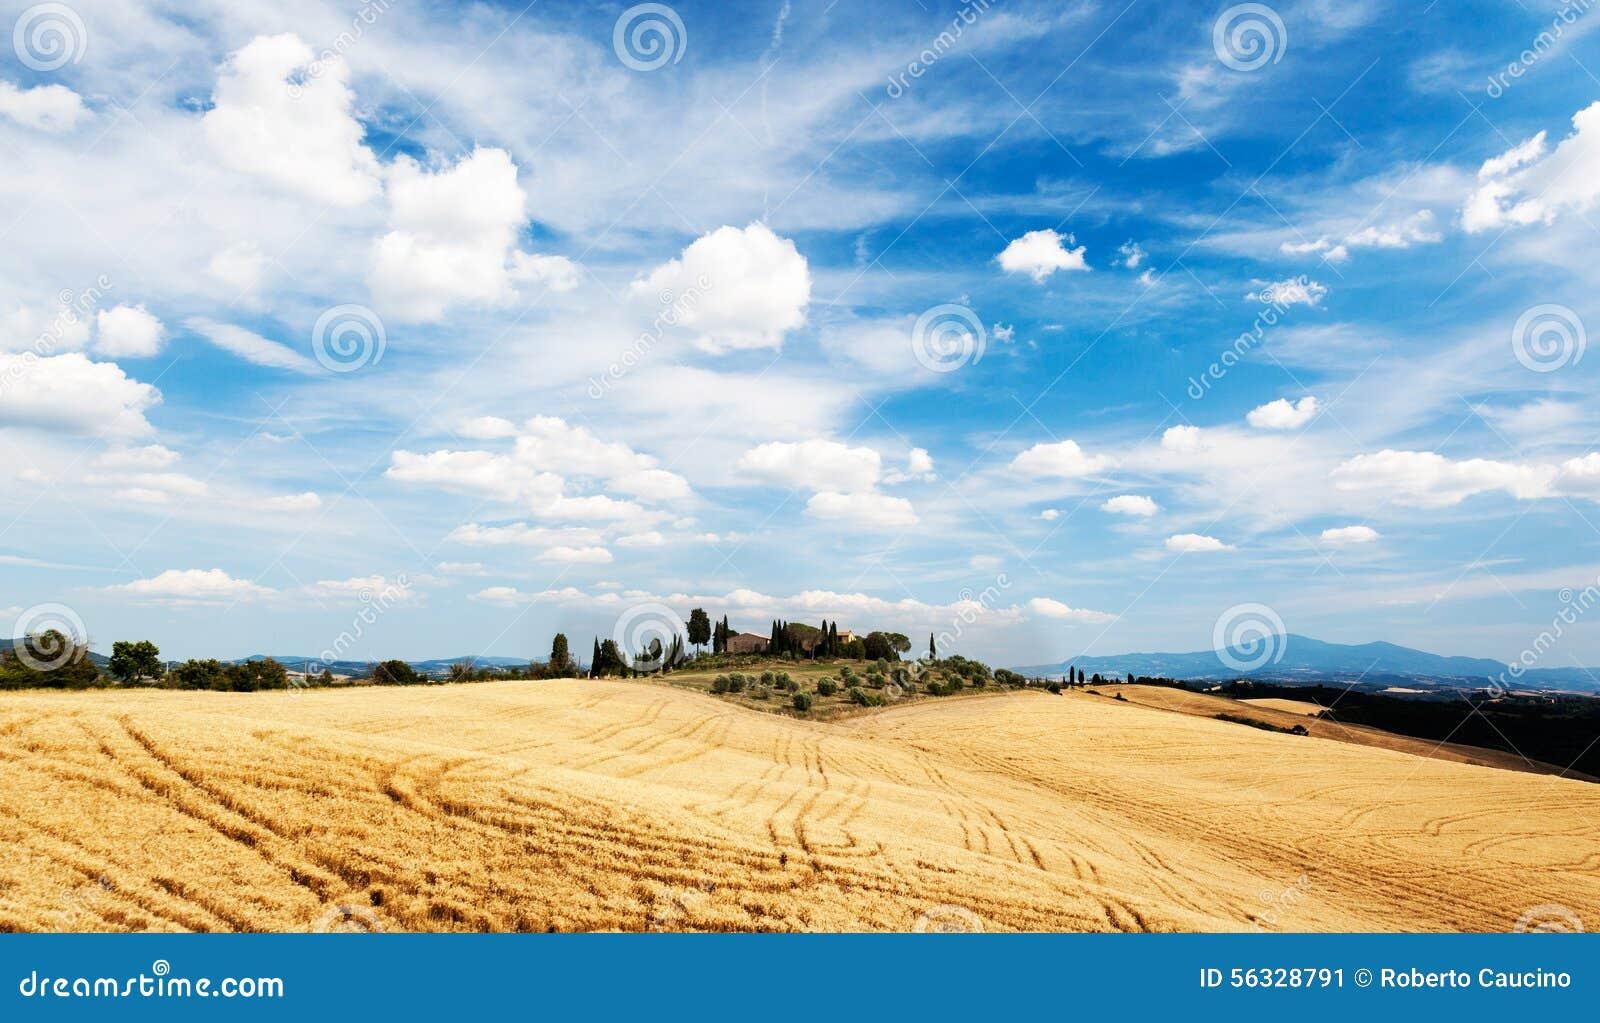 Case Rurali Toscane : Campagna toscana in un giorno soleggiato di estate case rurali sul a